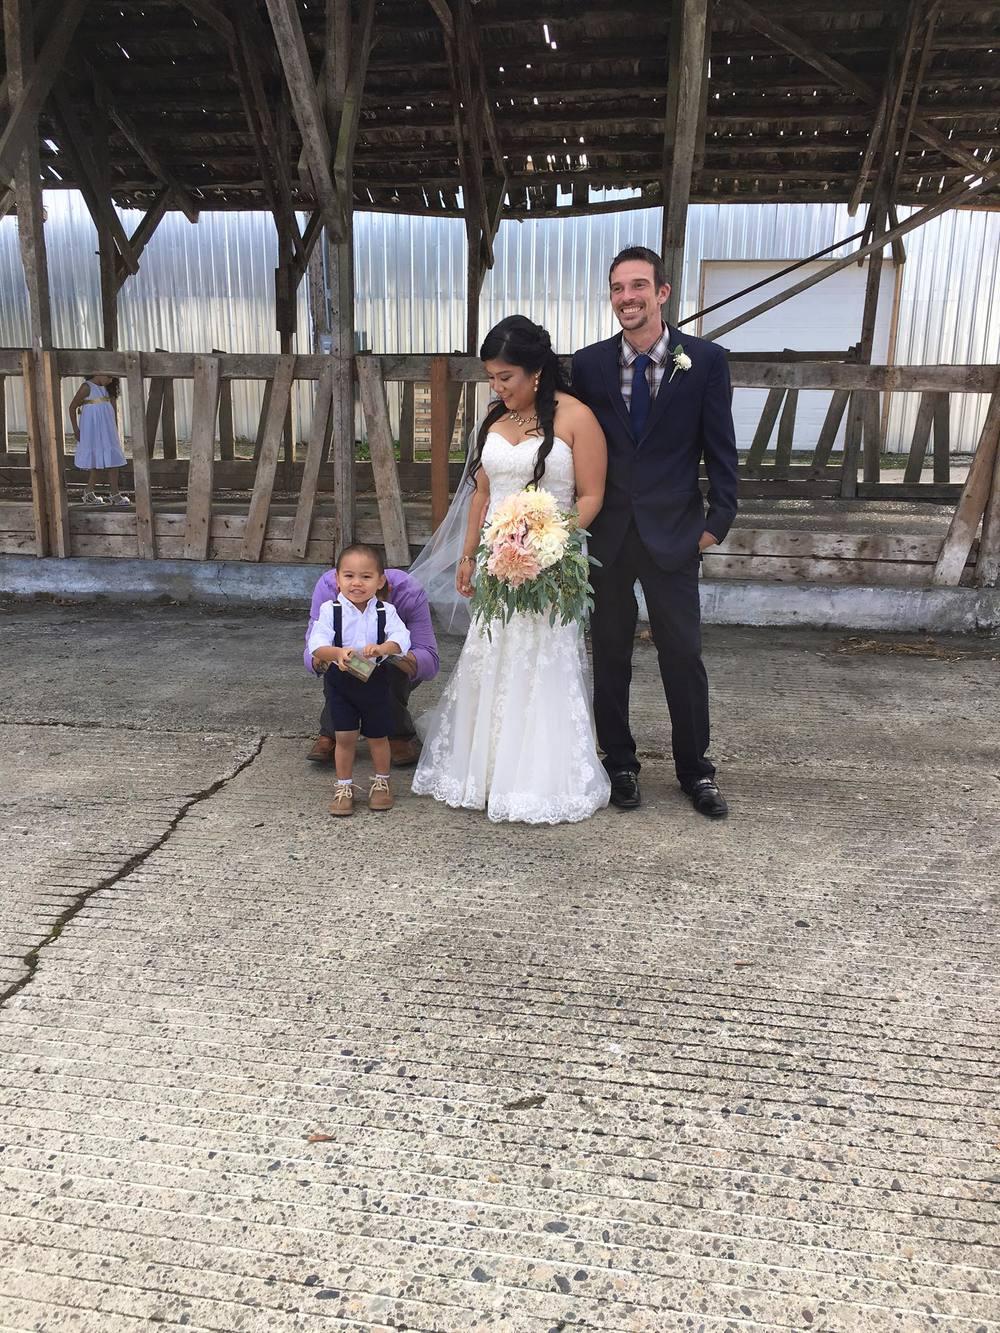 September -Melanie and Jd at Dairyland Farms